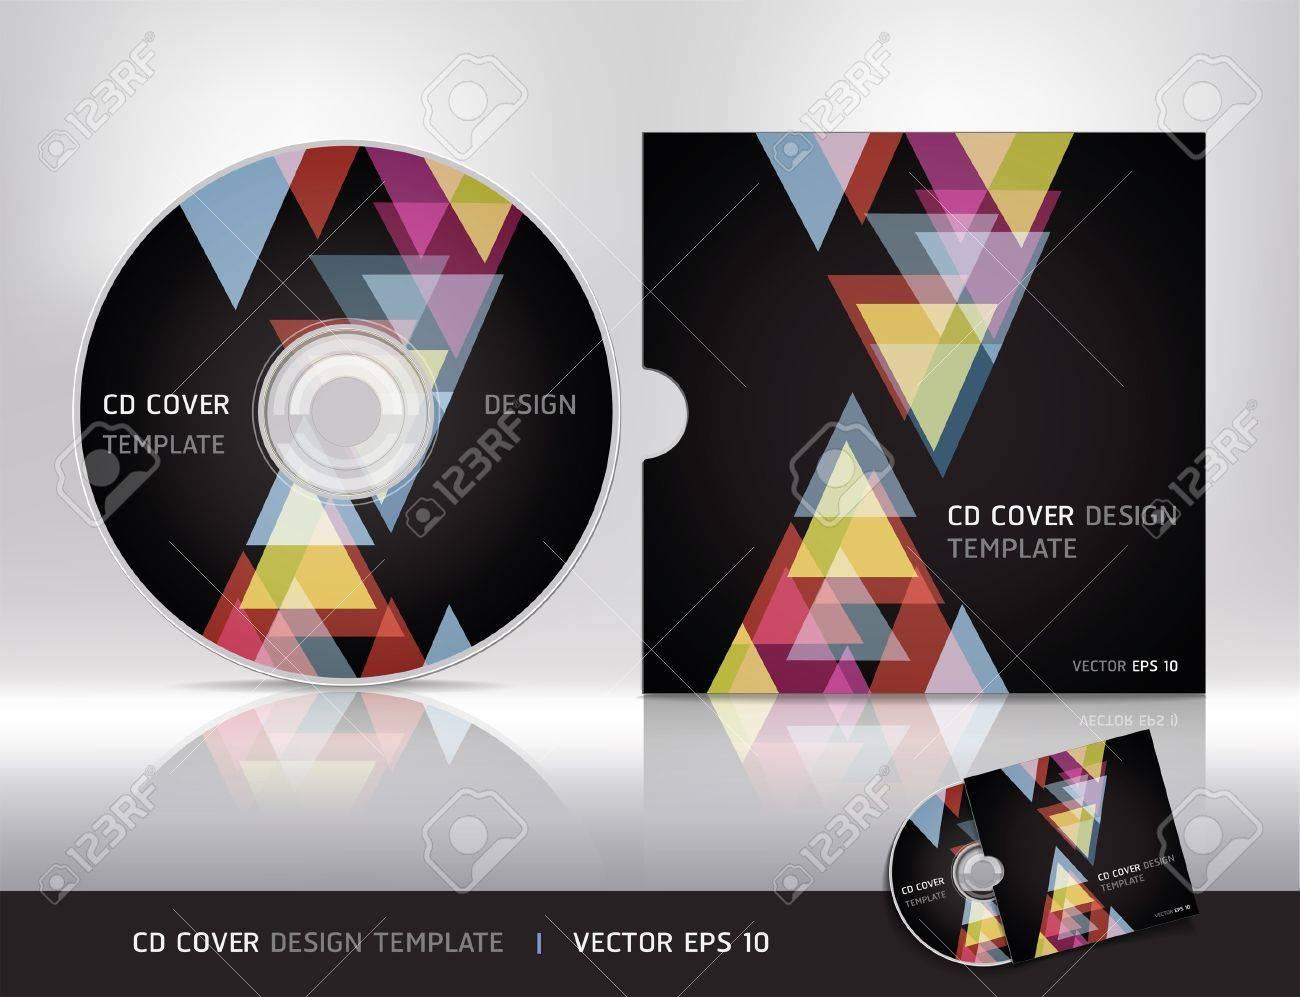 Cd cover design template Vector illustration Stock Vector - 18759309